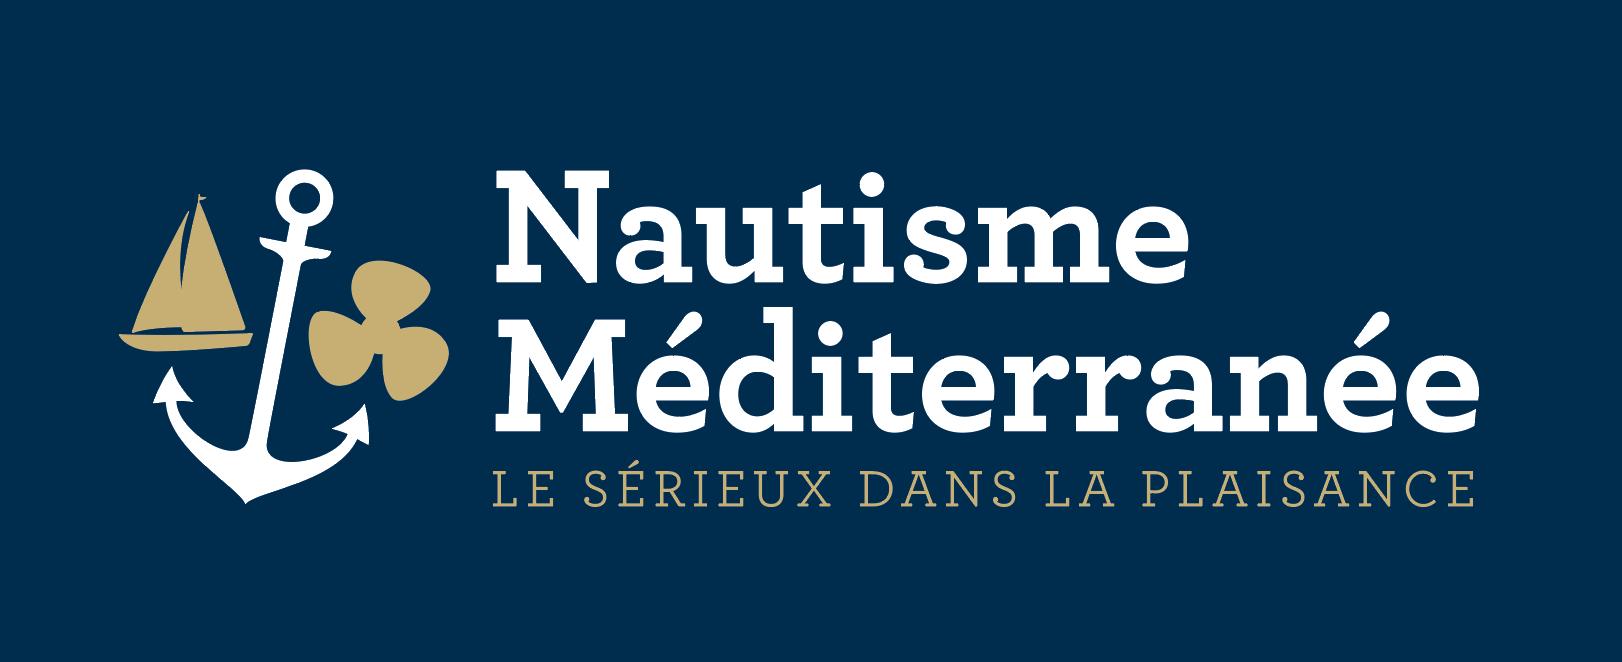 Nautisme mediterranee